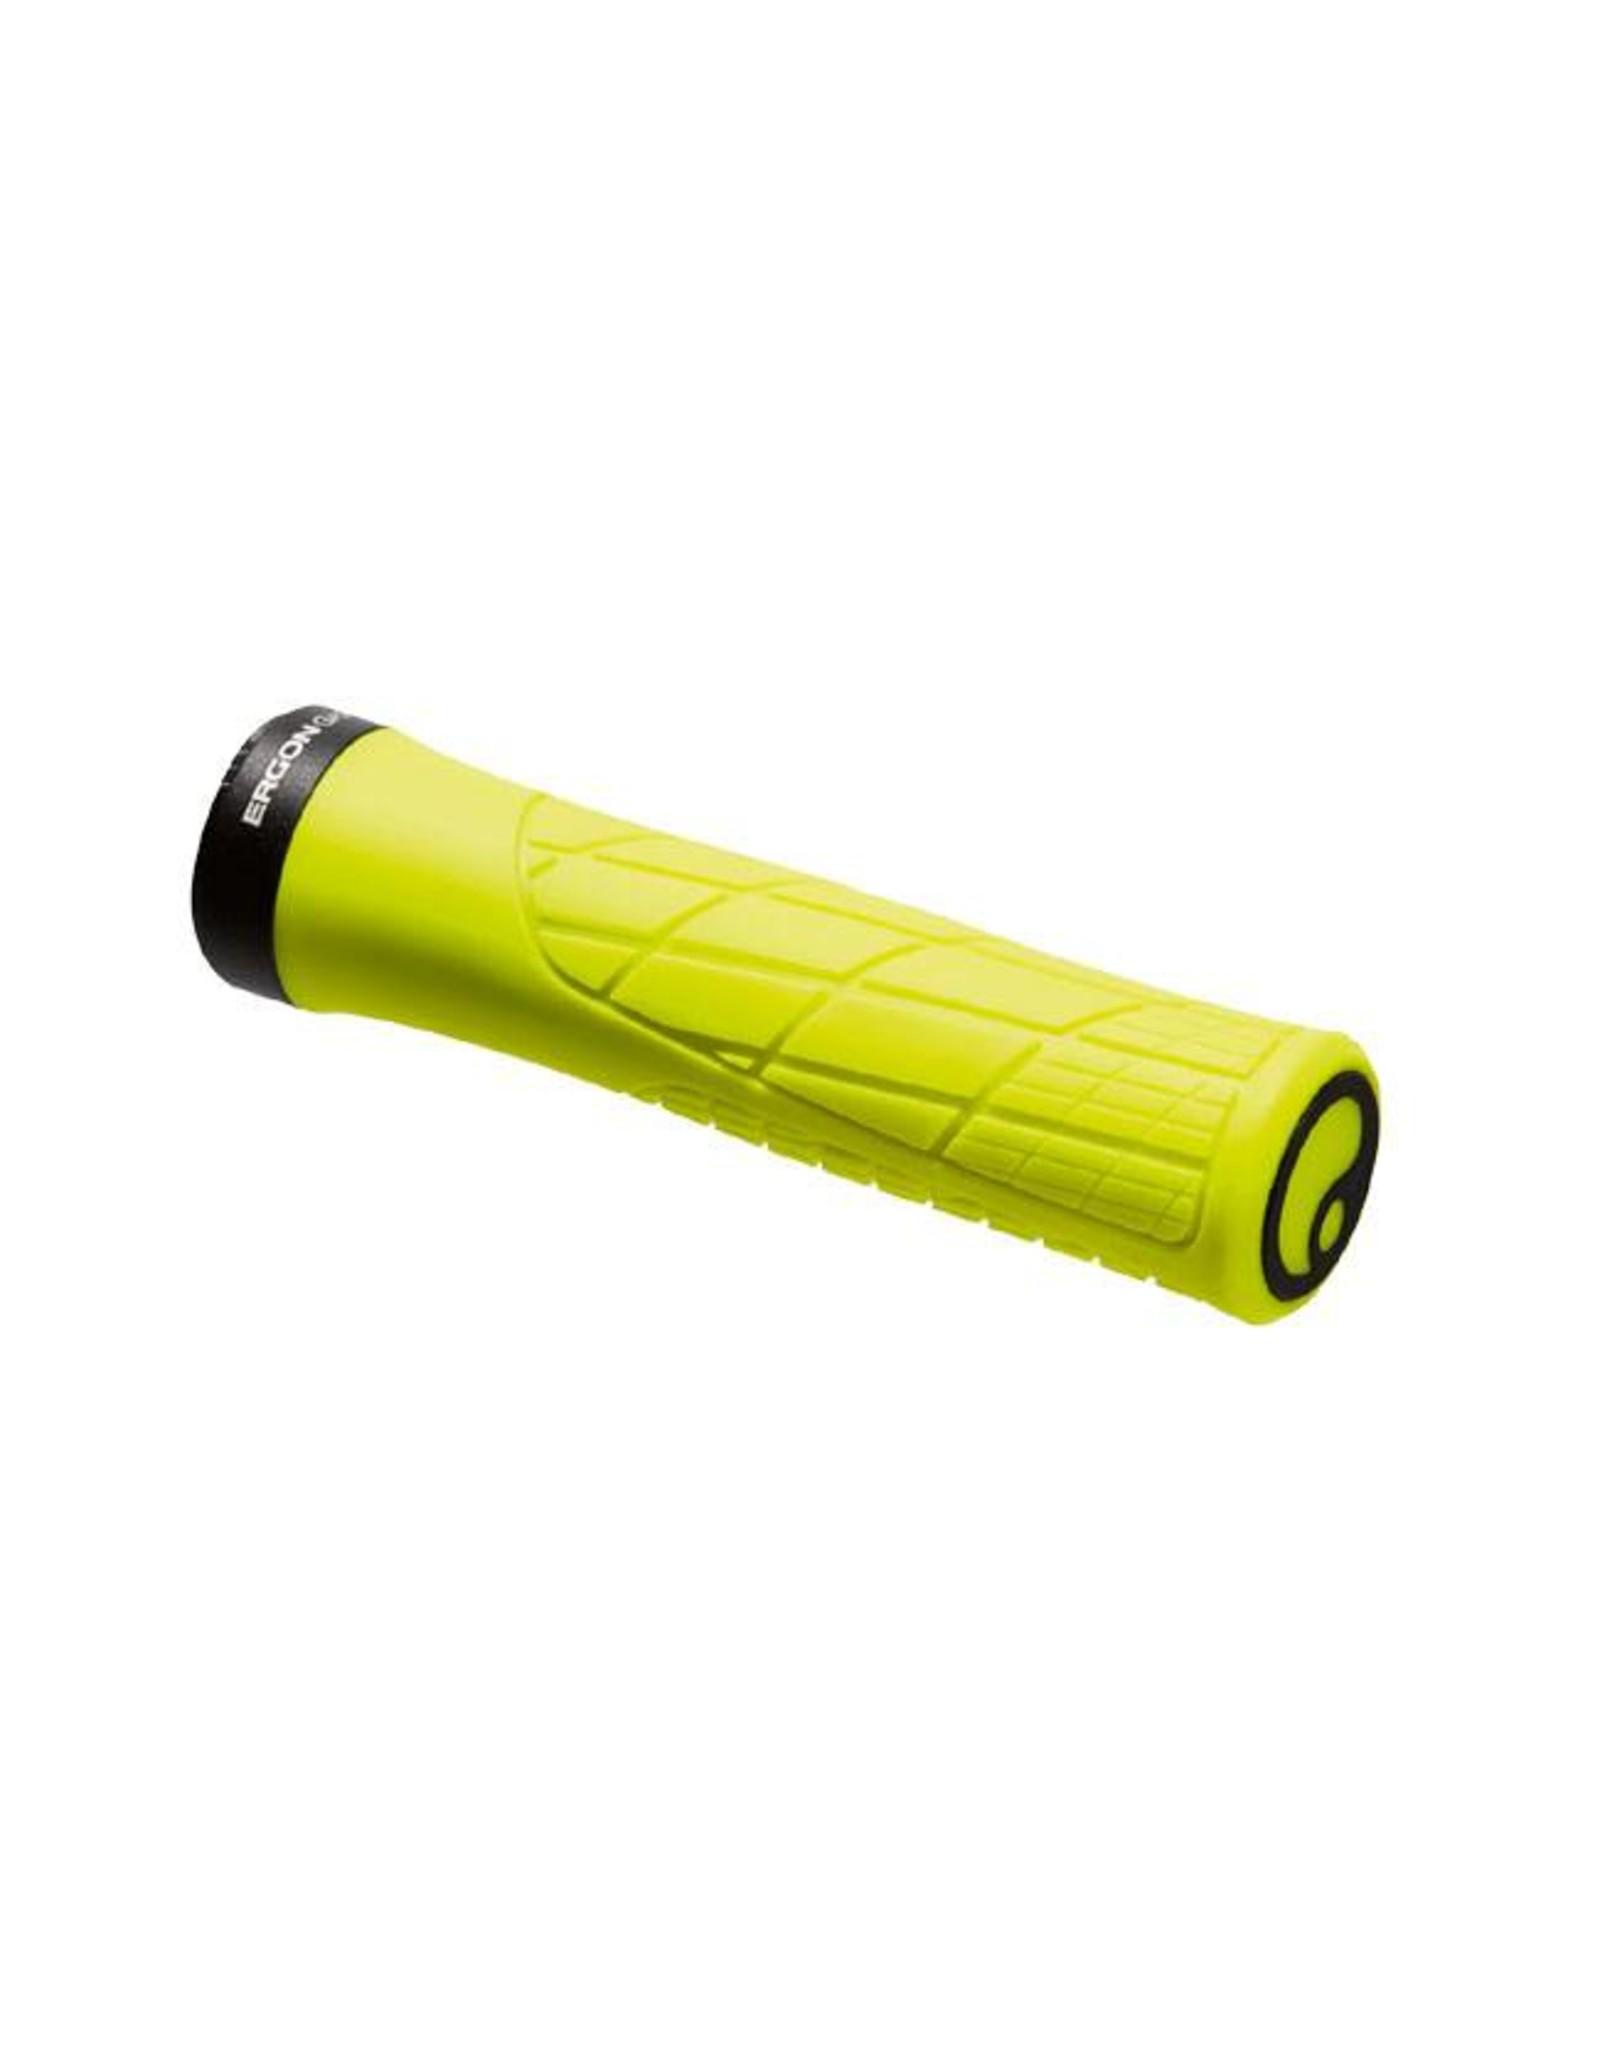 Ergon Ergon GA2 Grip: Laser Lemon